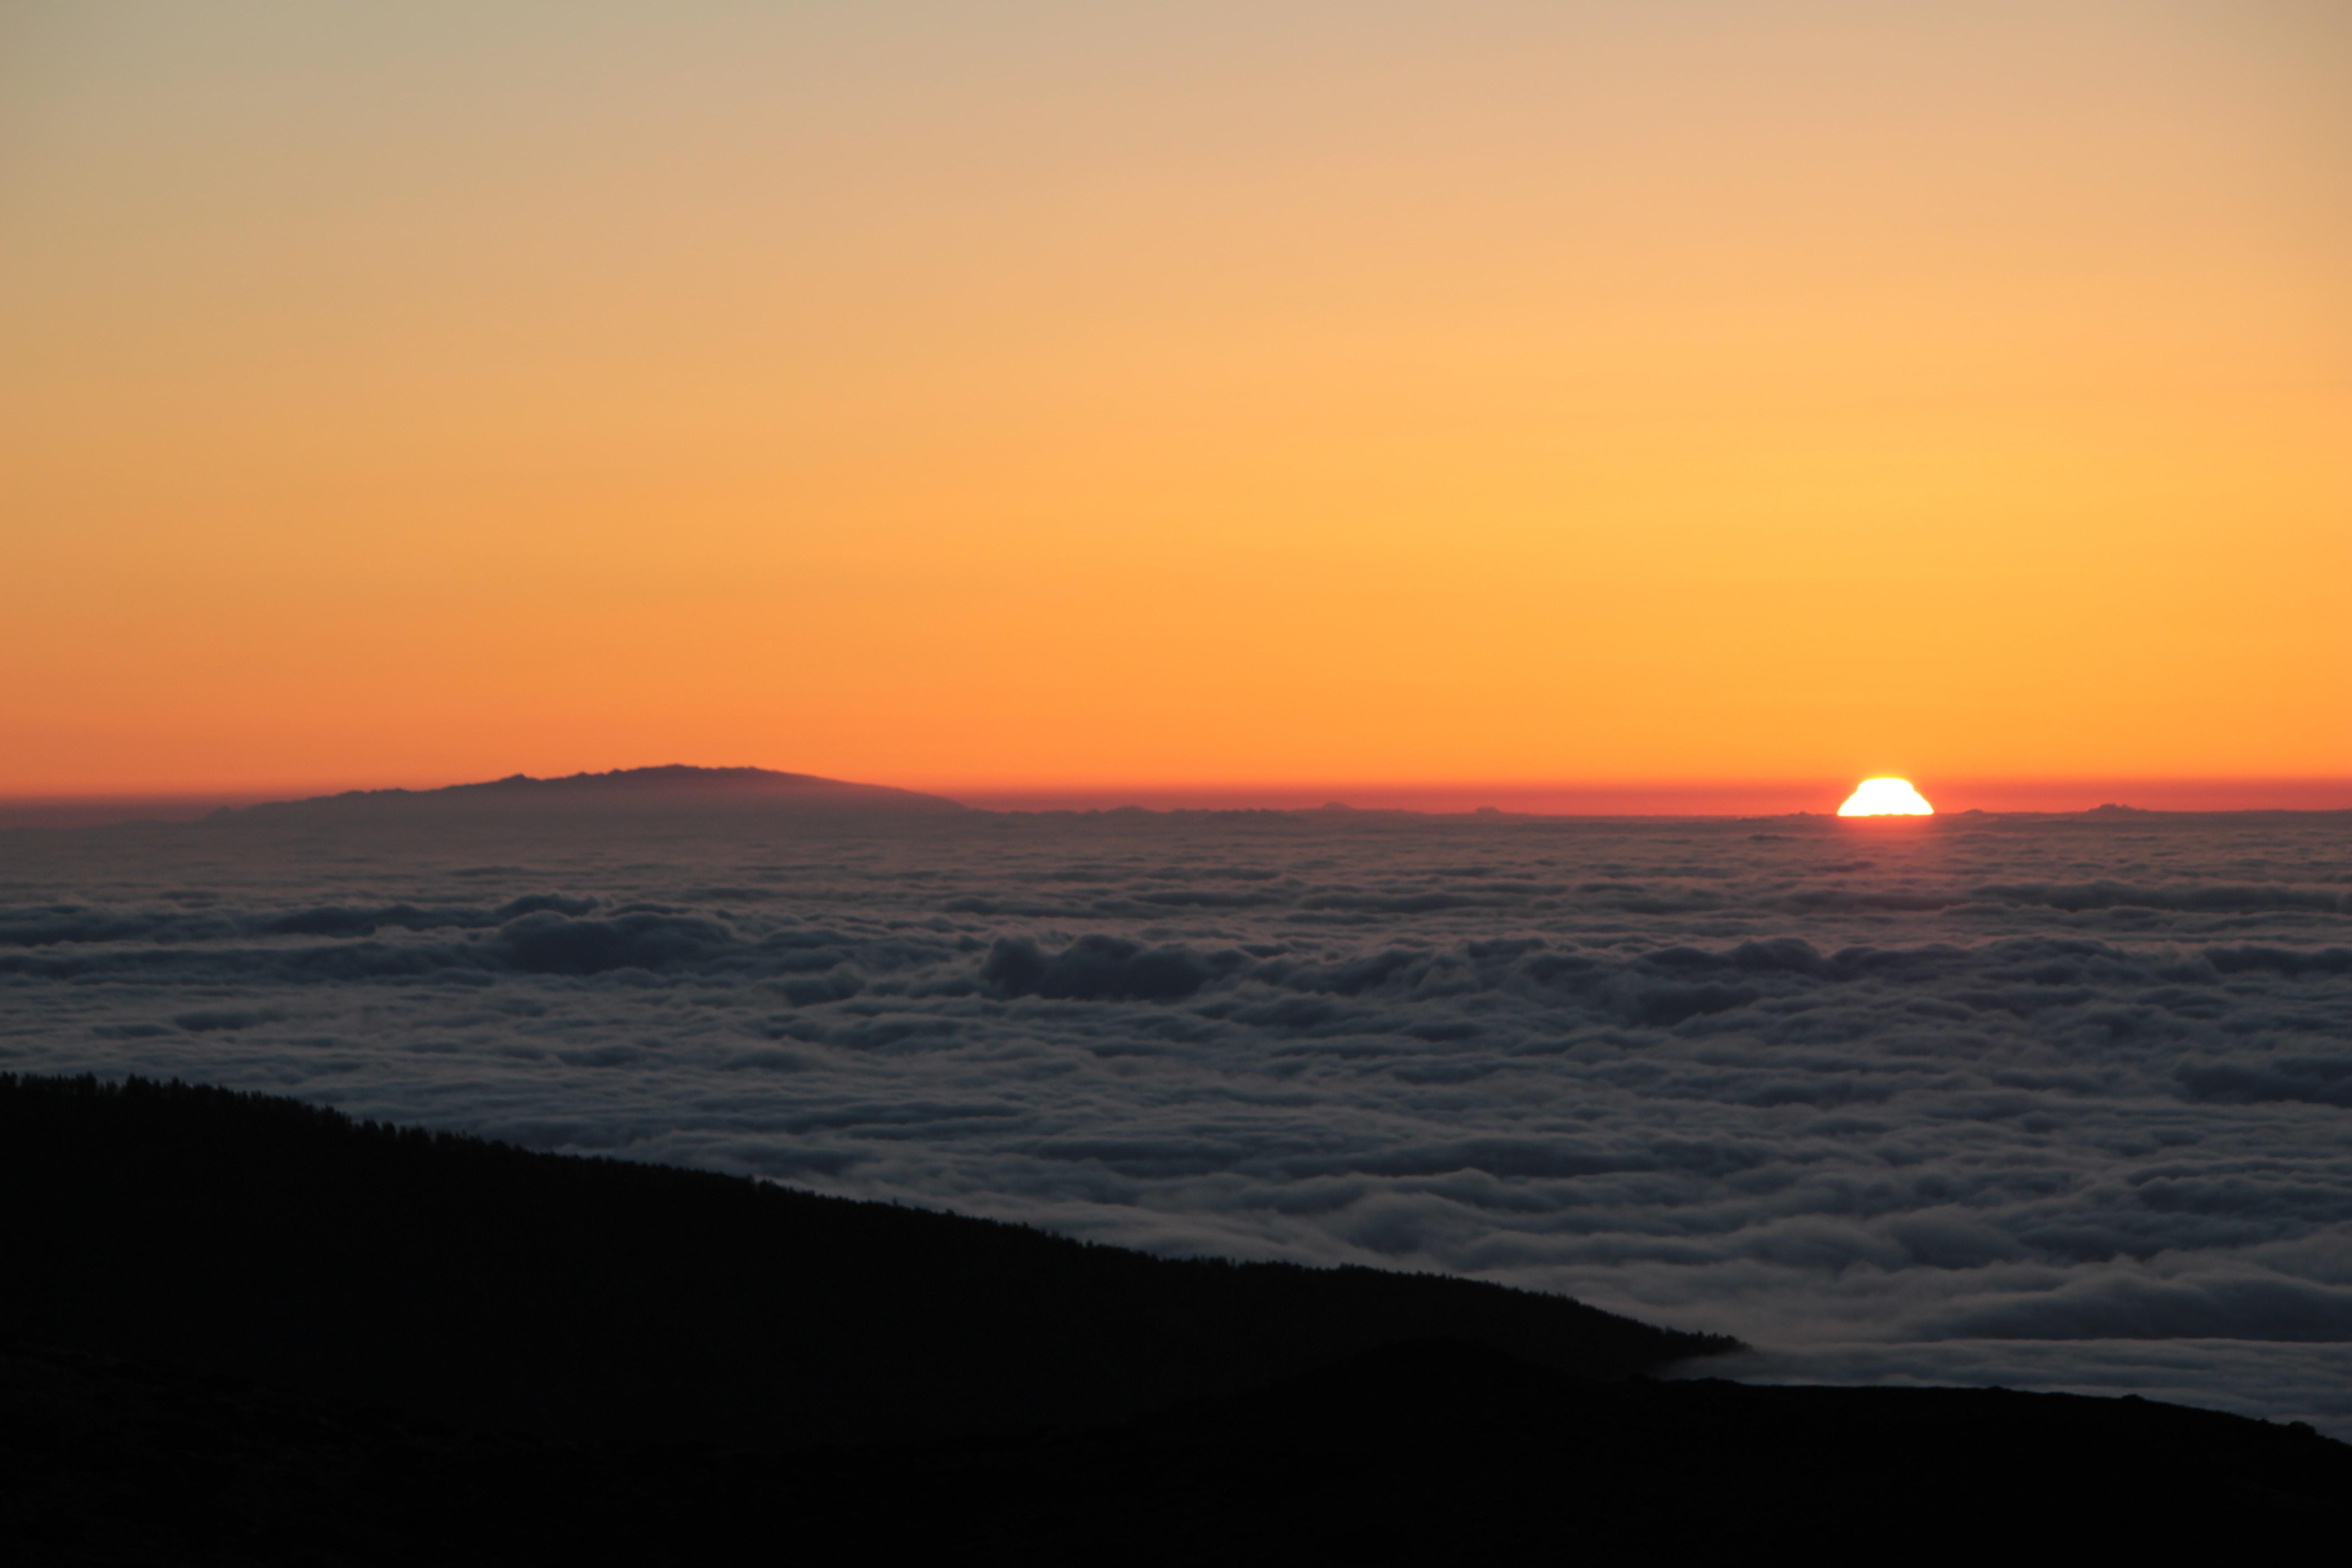 sun set over the horizon